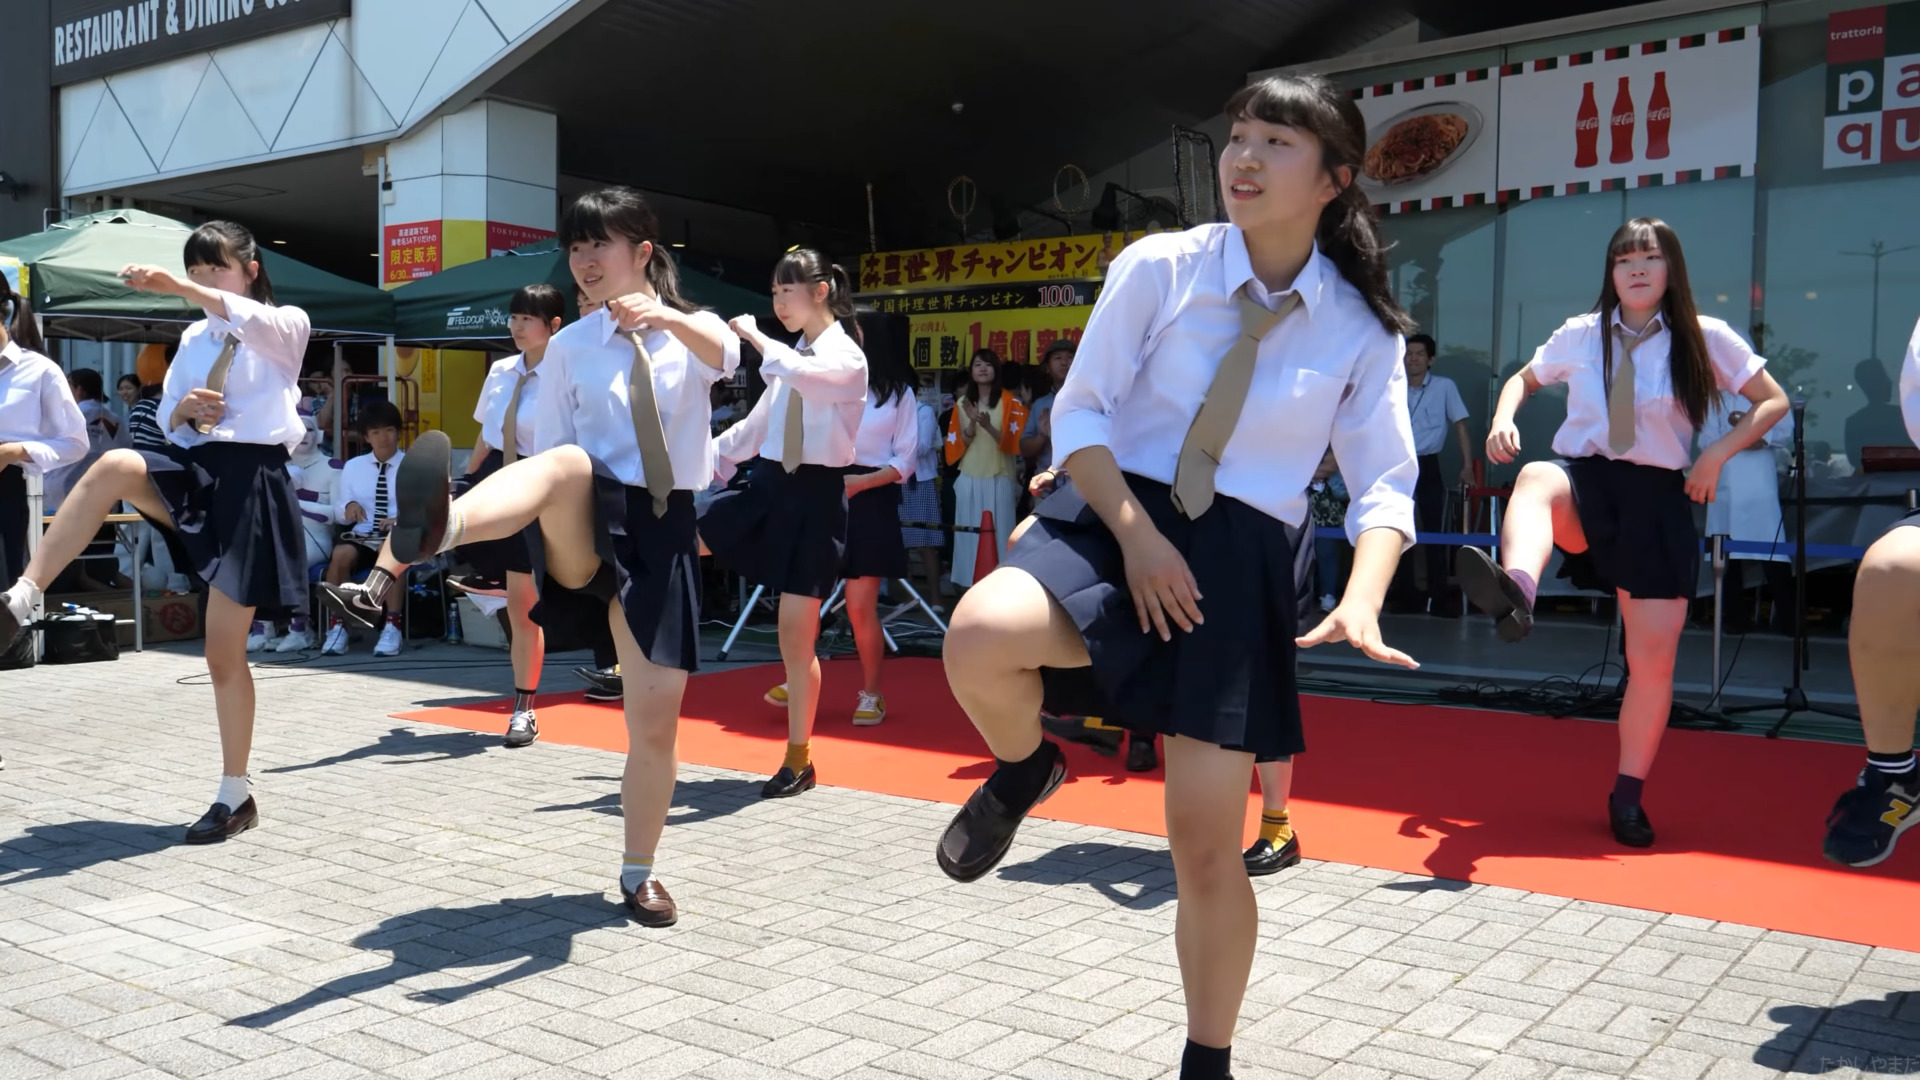 [4k 60p] 海老名高校 ダンス部 - U.S.A. 01:34